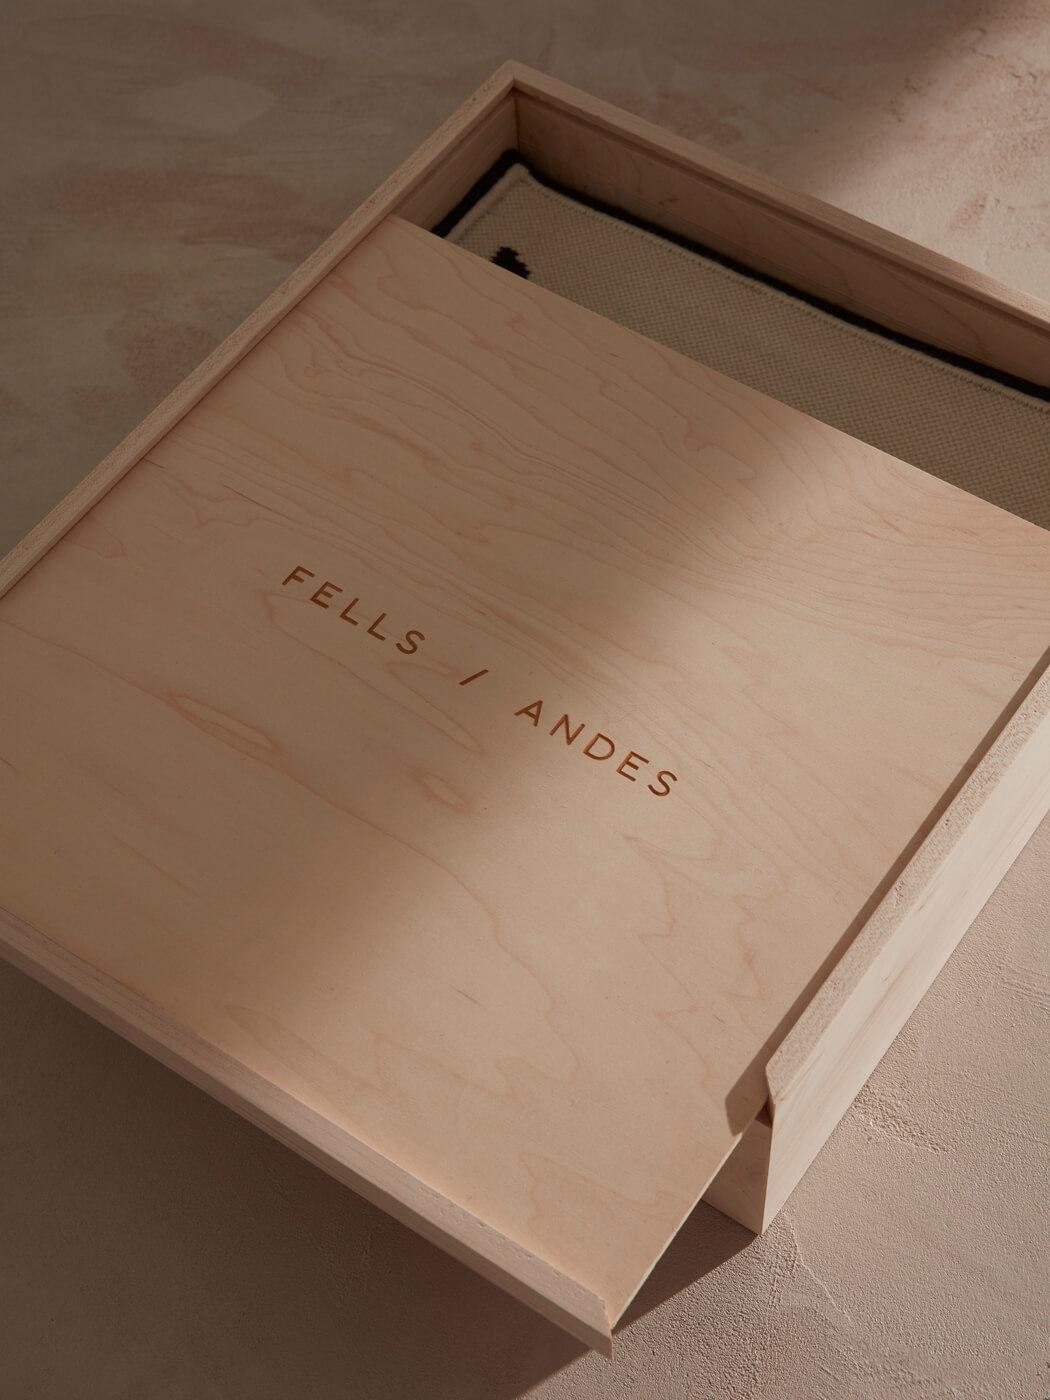 FELLS-ANDES-RUG-SWATCH-BOX.jpg